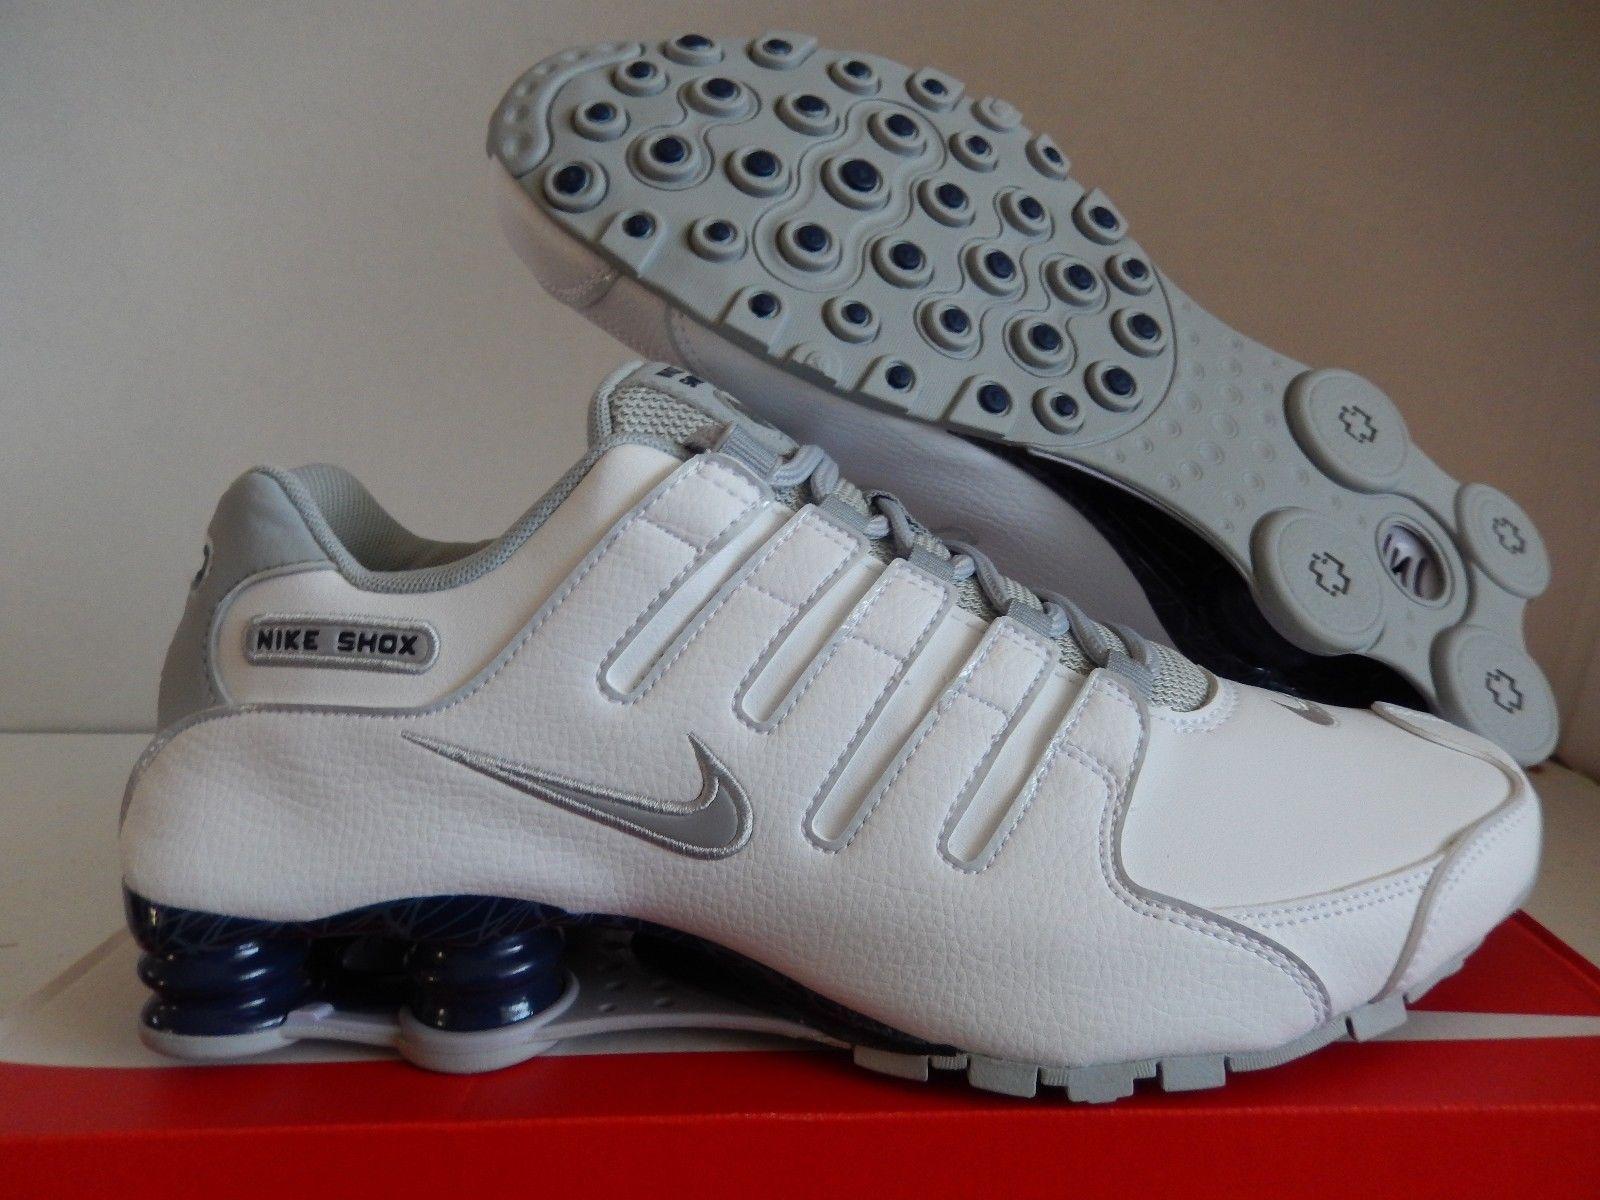 nike shox nx kd all shoes